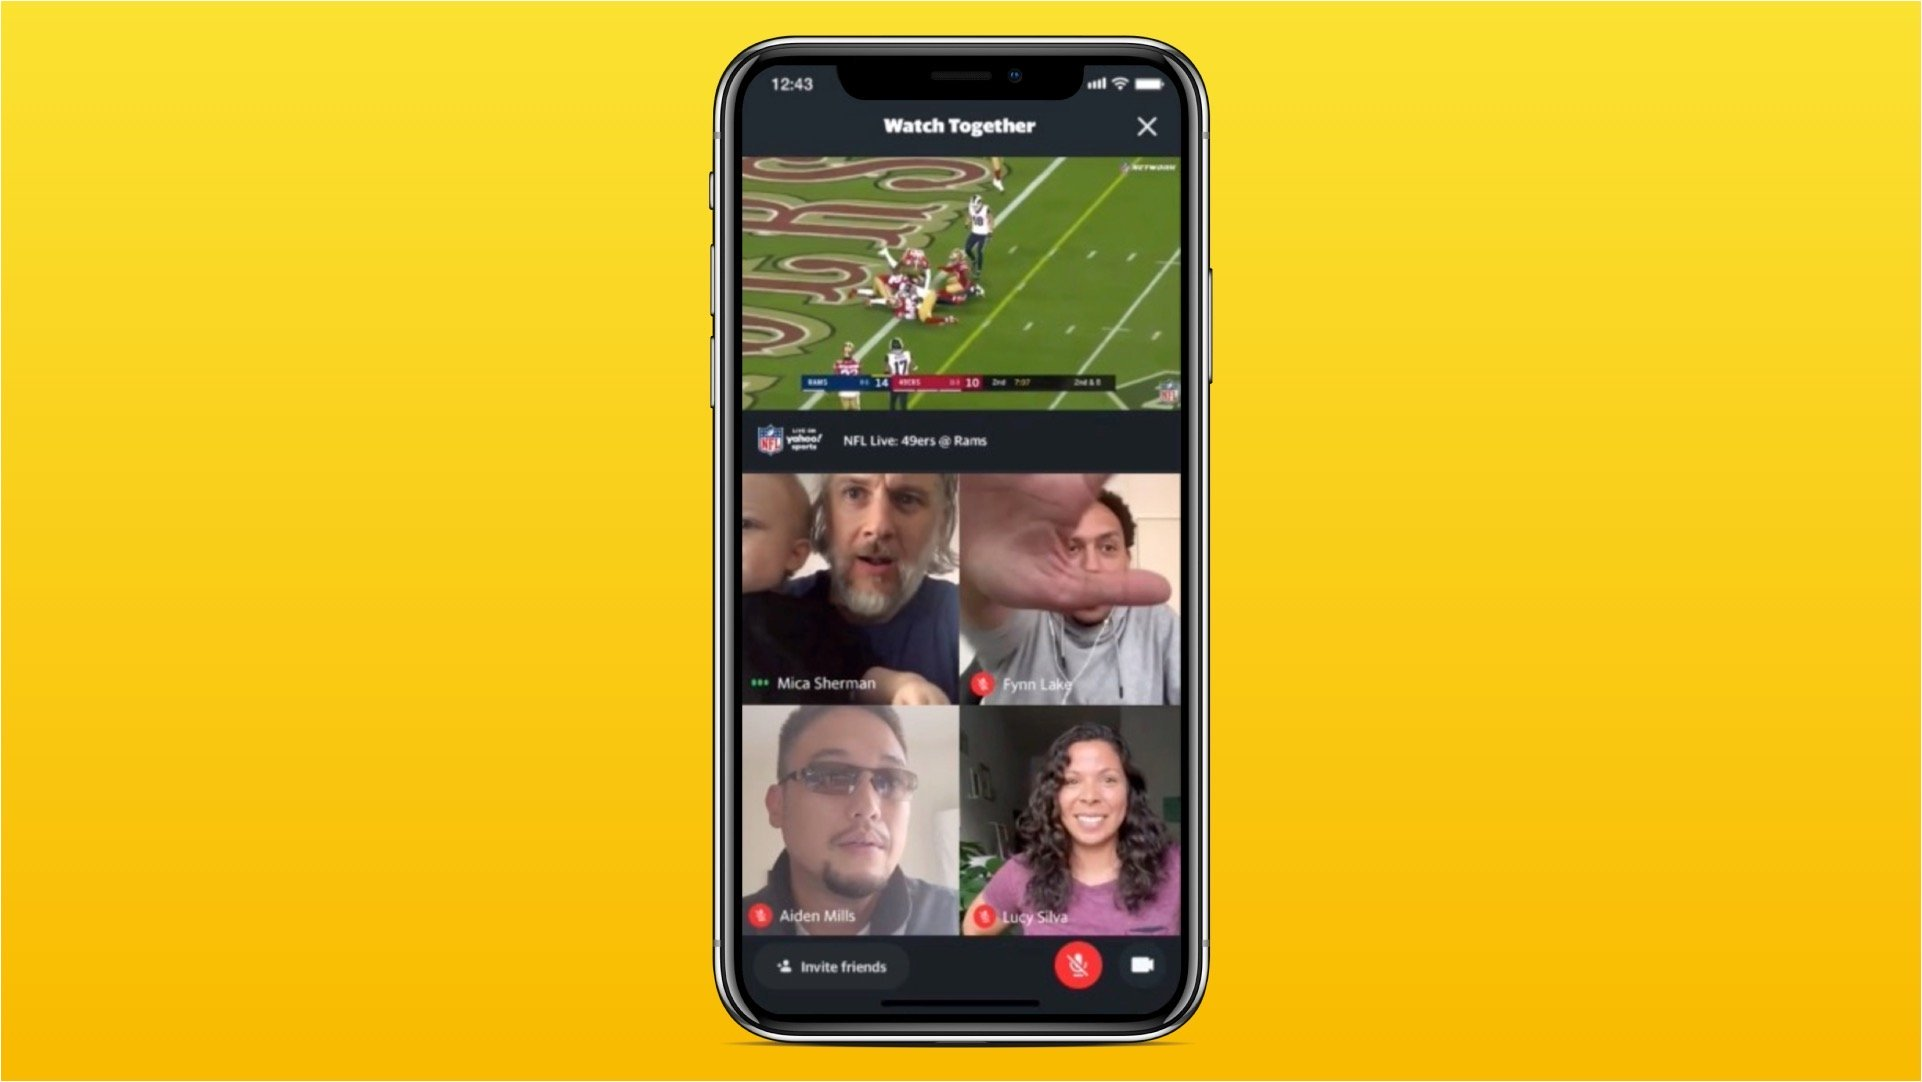 Fox to stream NFL games on Fox Sports Go